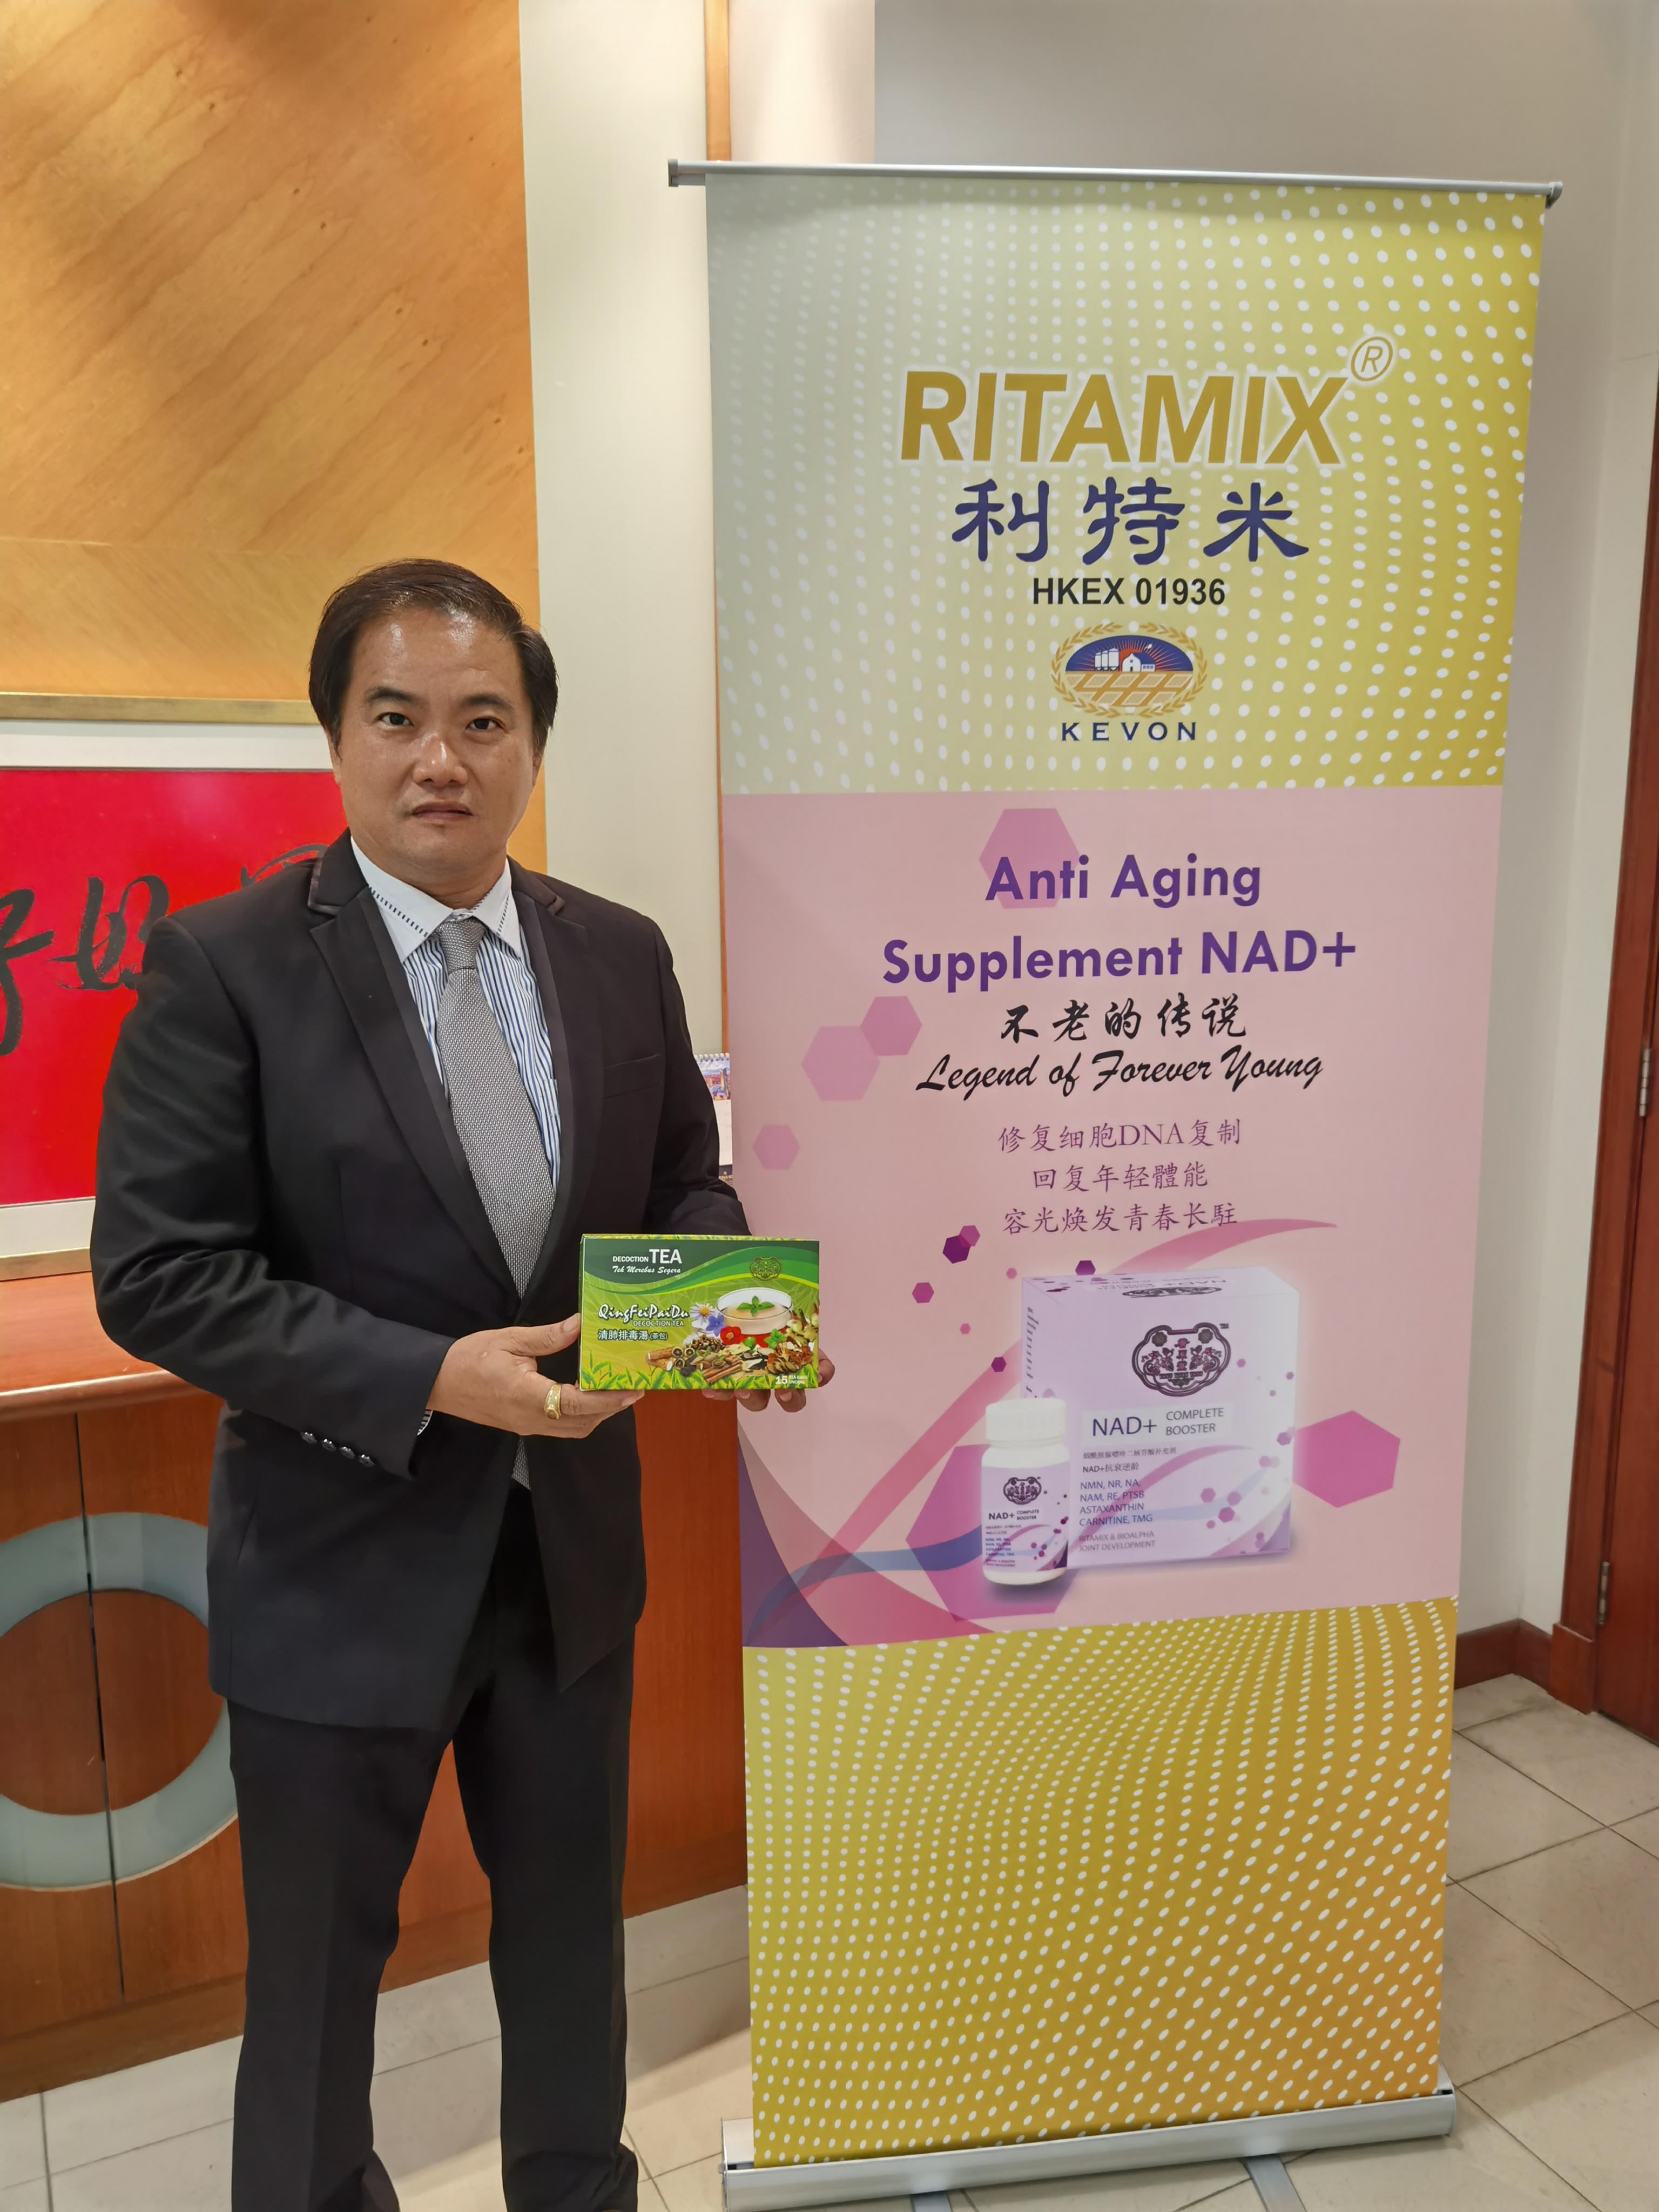 Ritamixs Qing Fei Pai Du Decoction Tea to hit the shelves soon